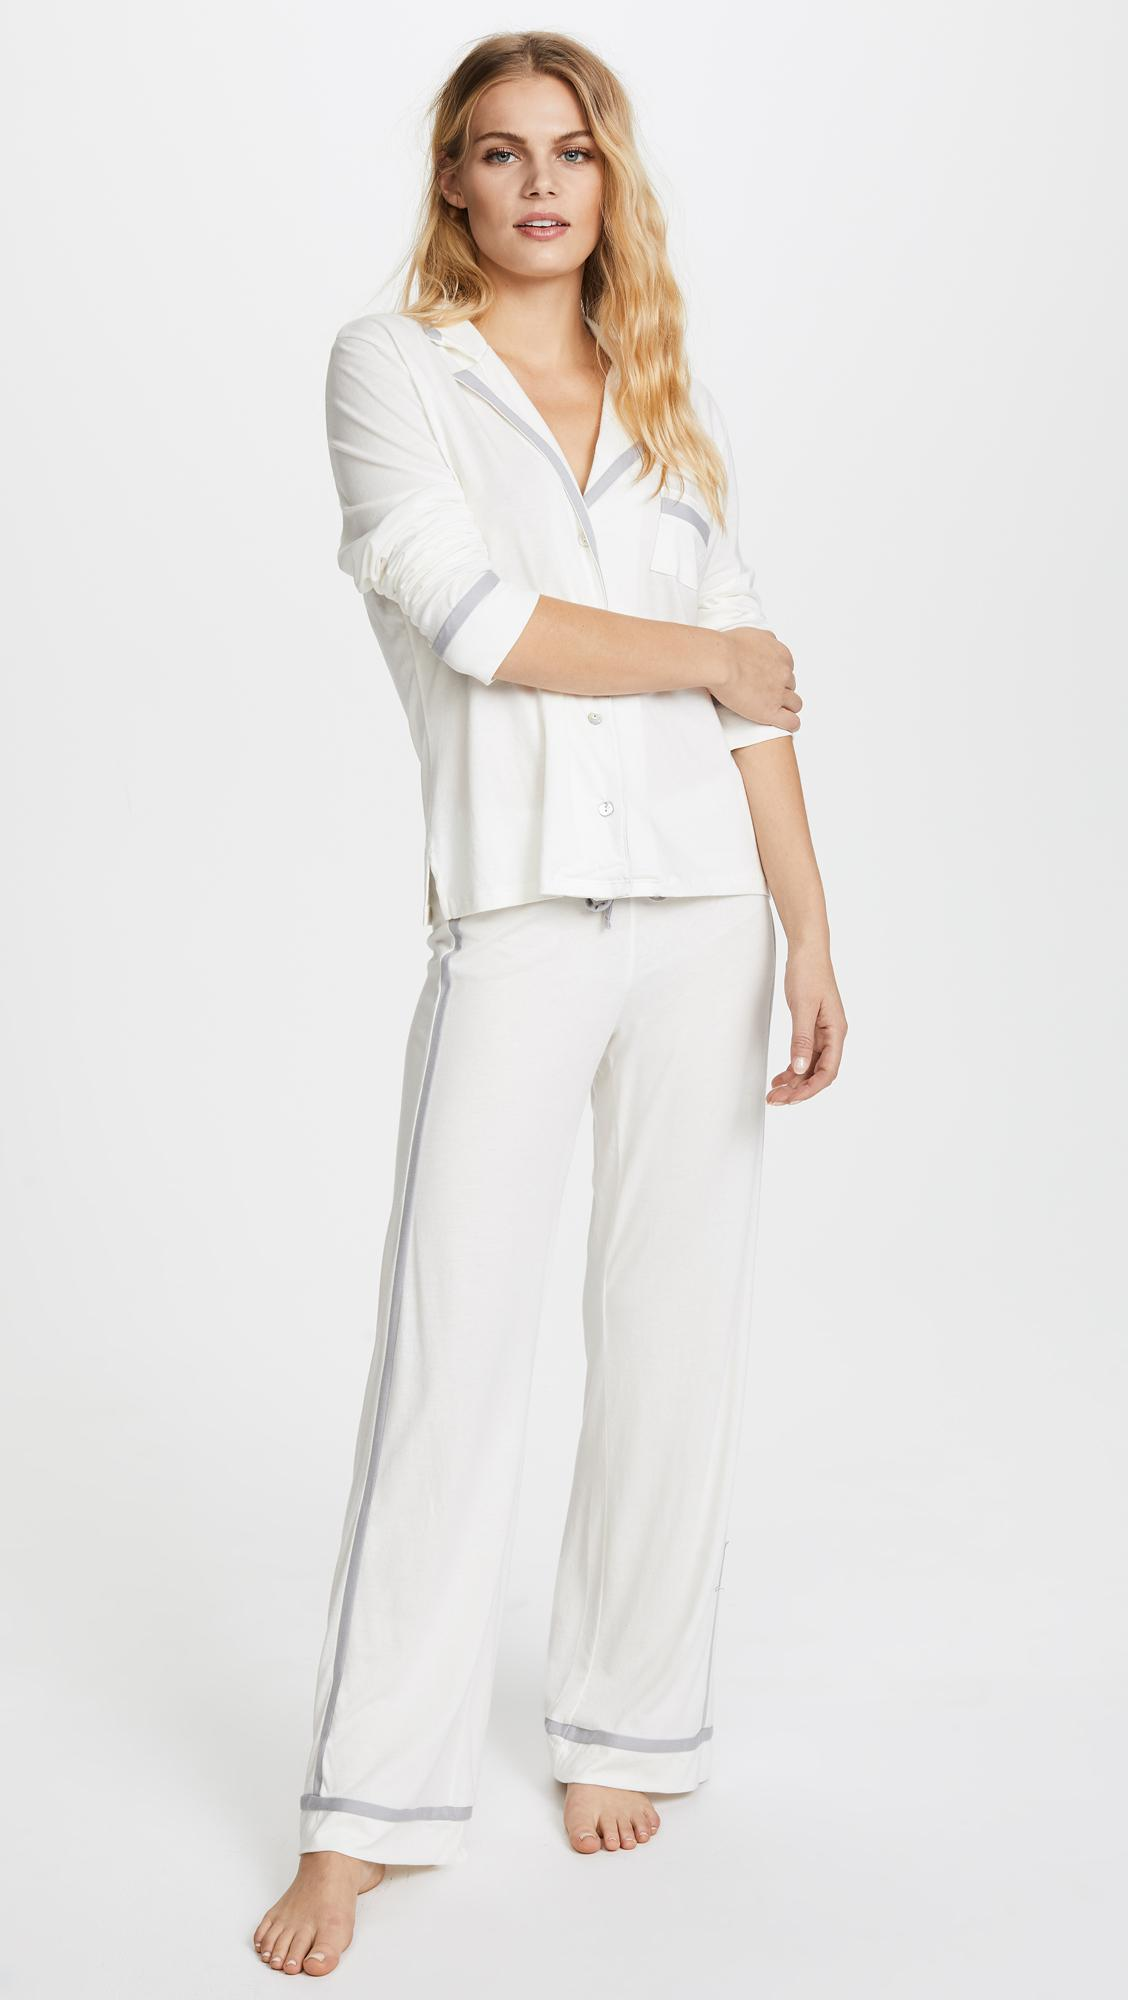 Cosabella. Women's White Bella Longsleeve Top & Pant Pj Set